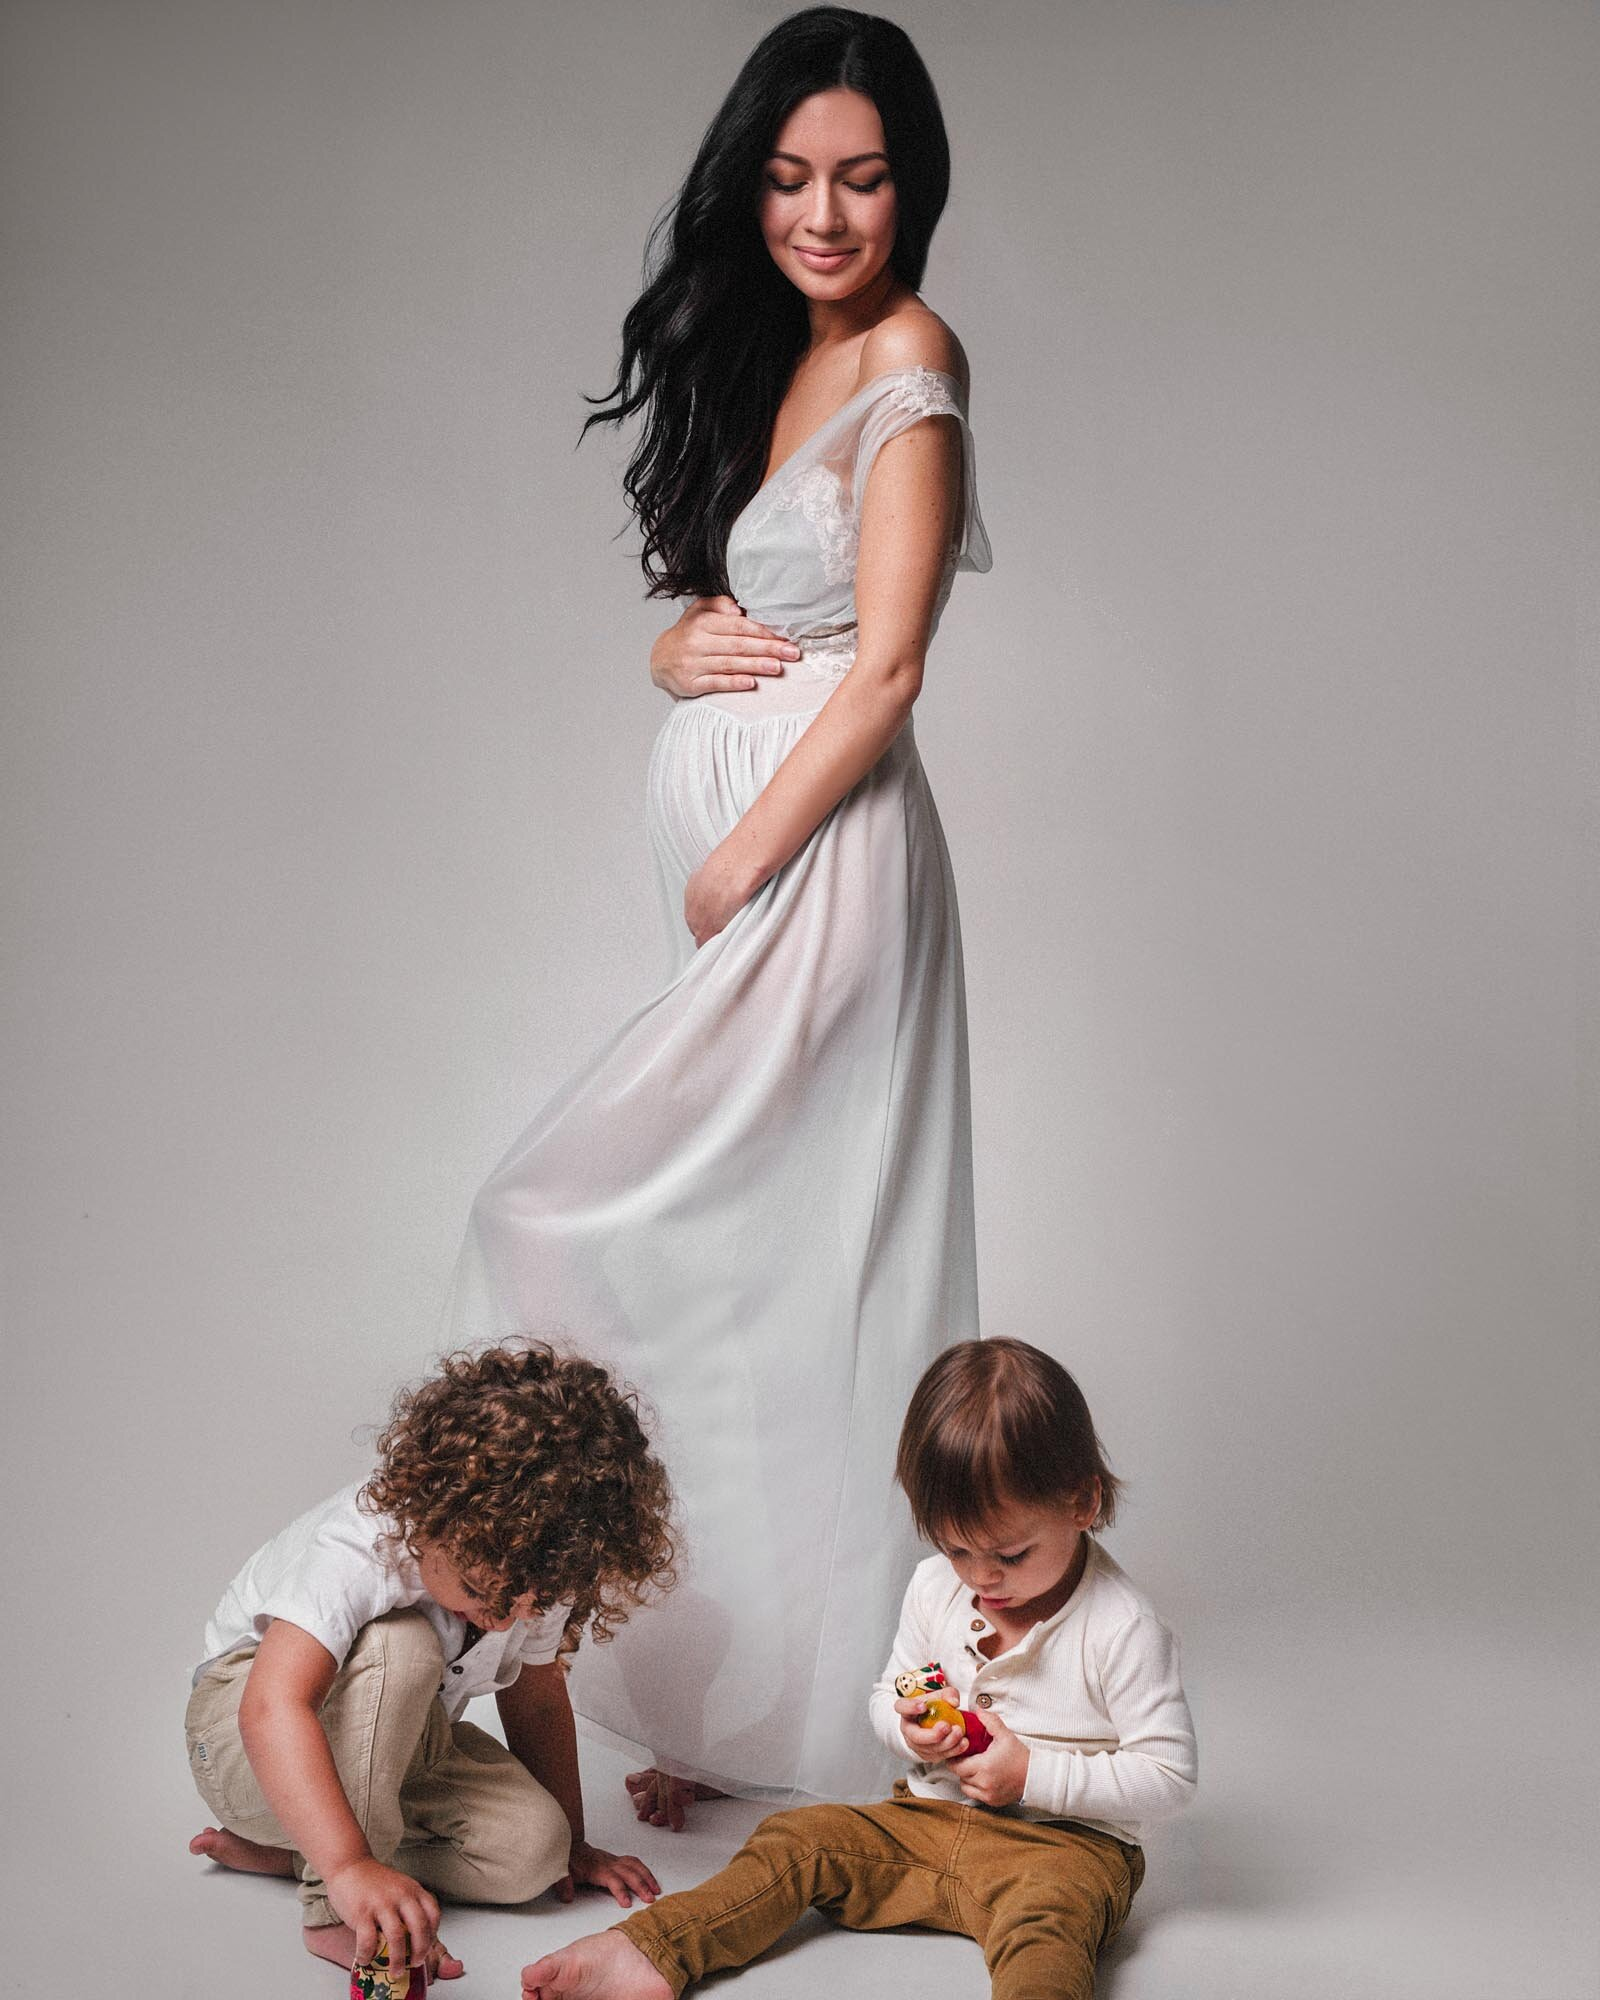 nyc-photographers-family-photographer-10011.jpg